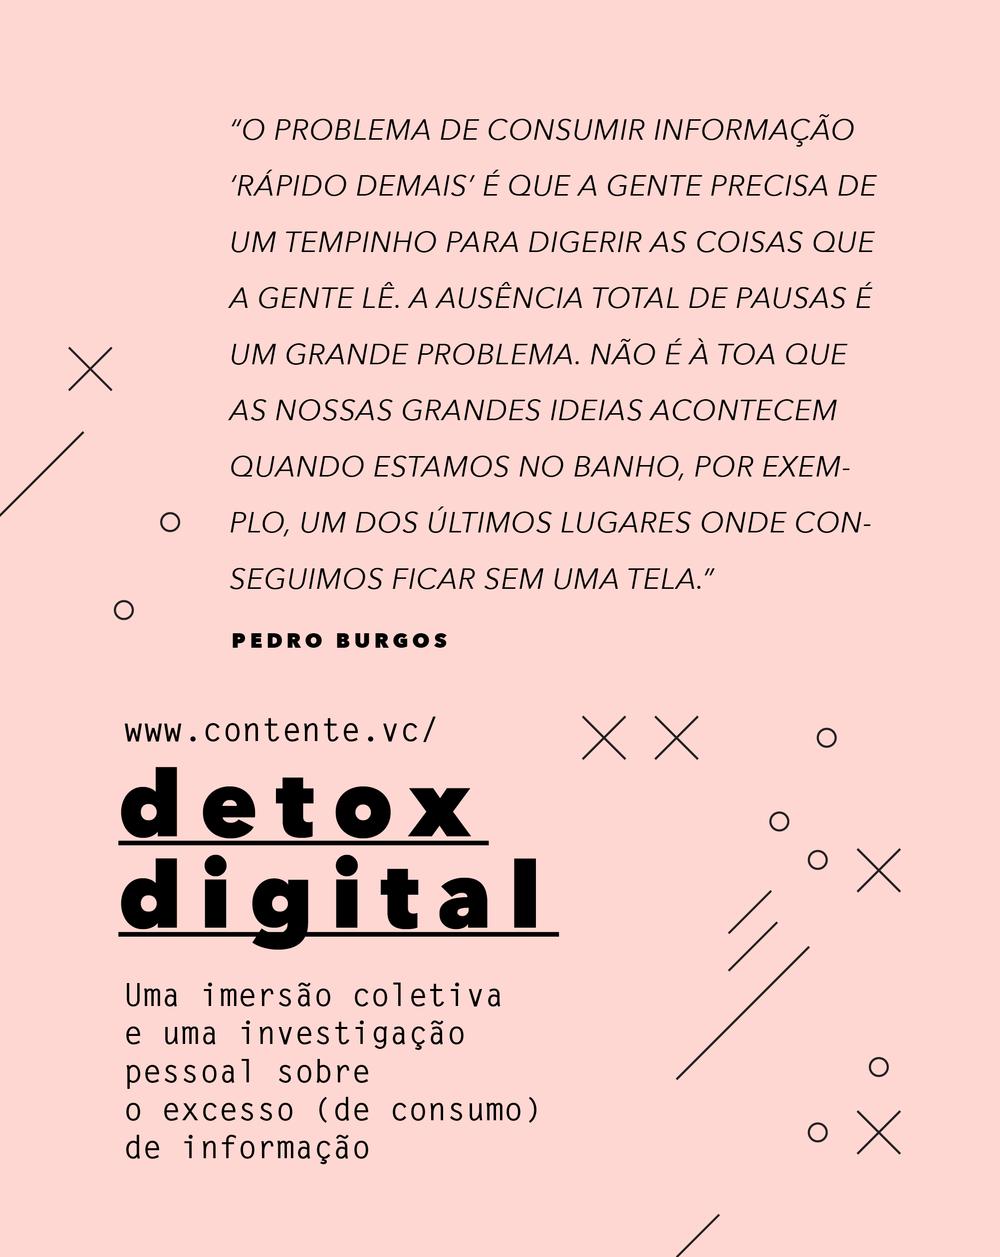 dettoxdigital-07.png